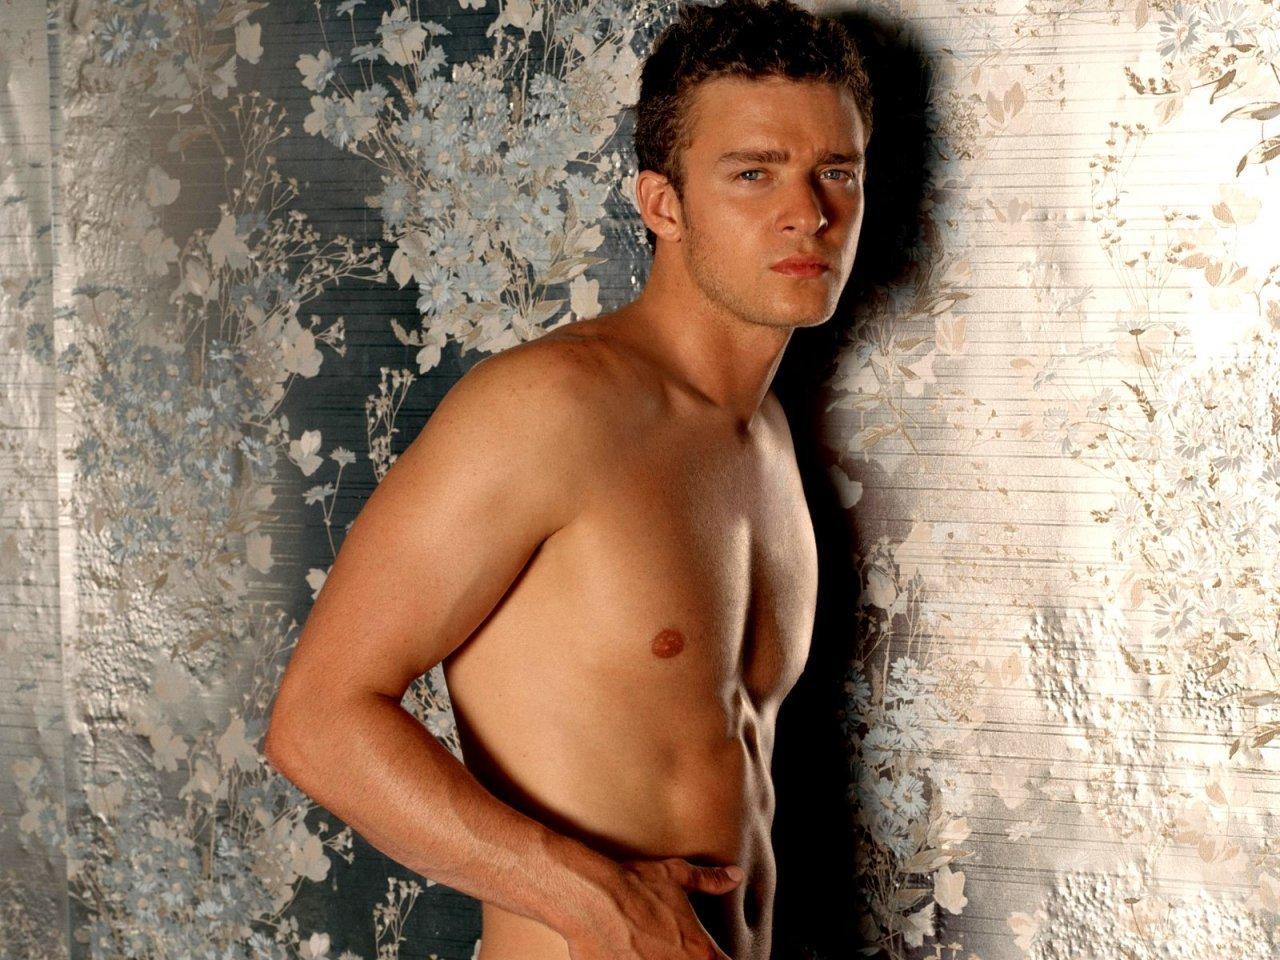 J.T. - Justin Timberlake Wallpaper (18476466) - Fanpop